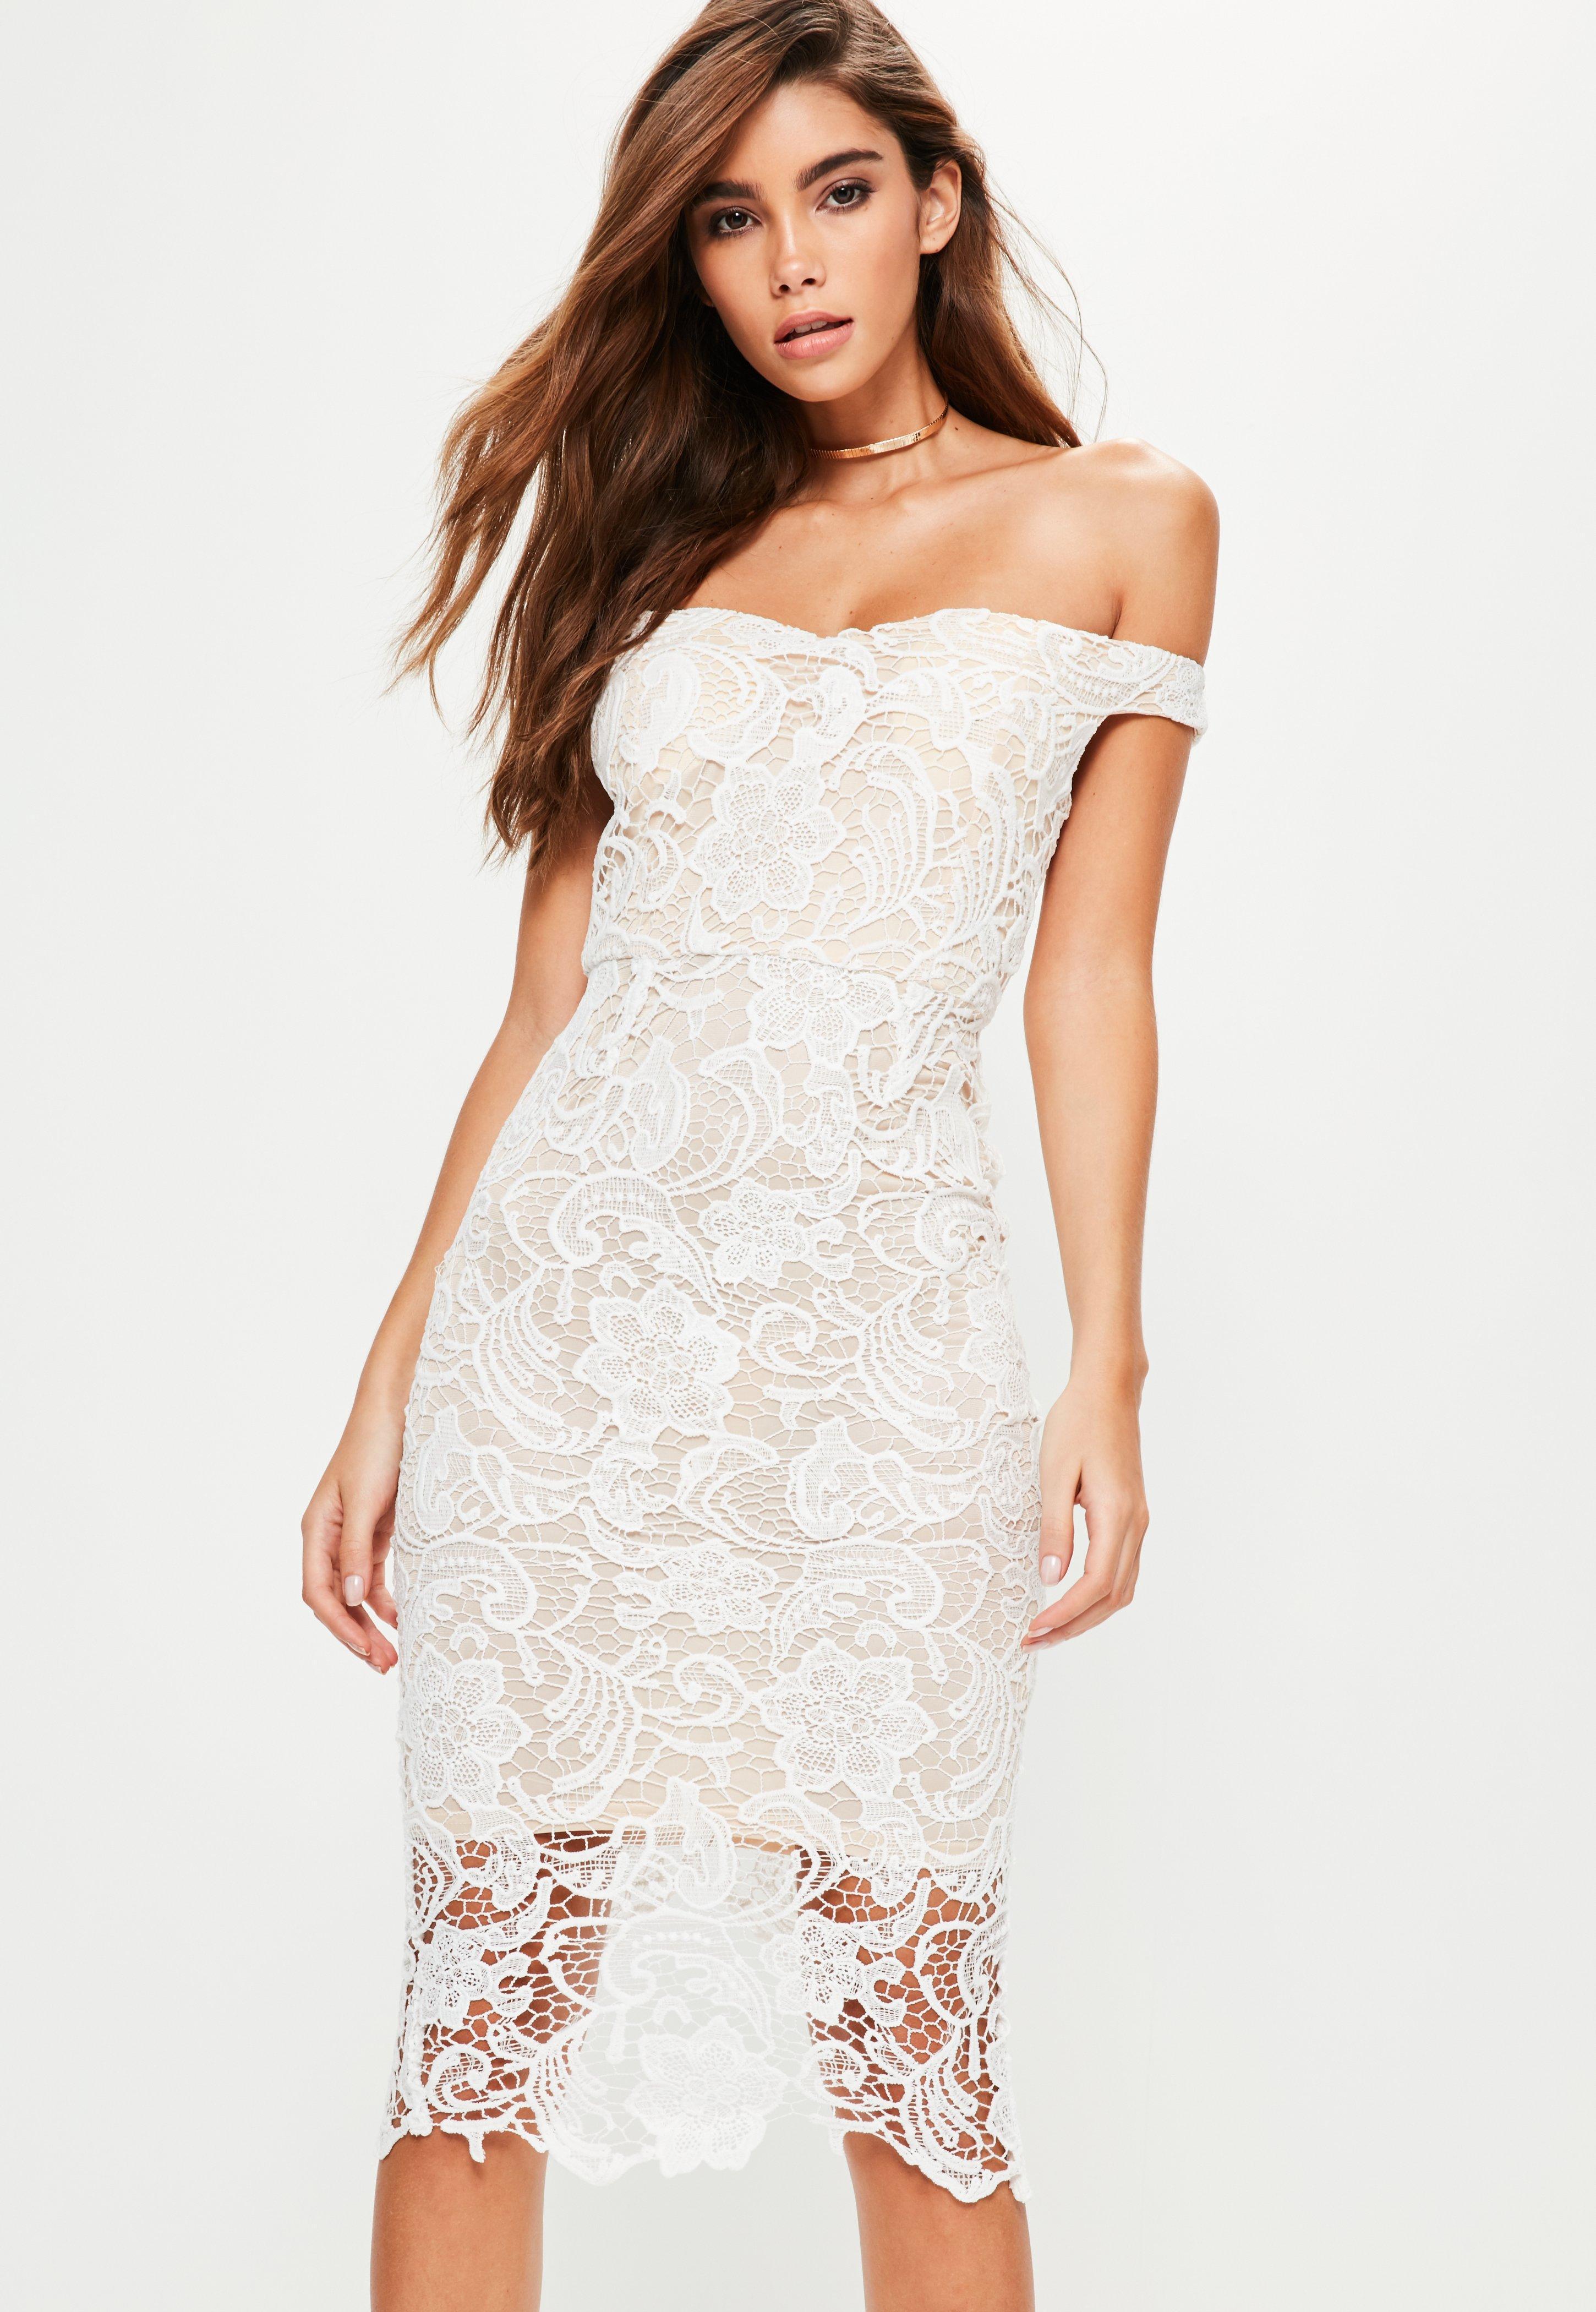 white lace dresses for graduation wwwpixsharkcom